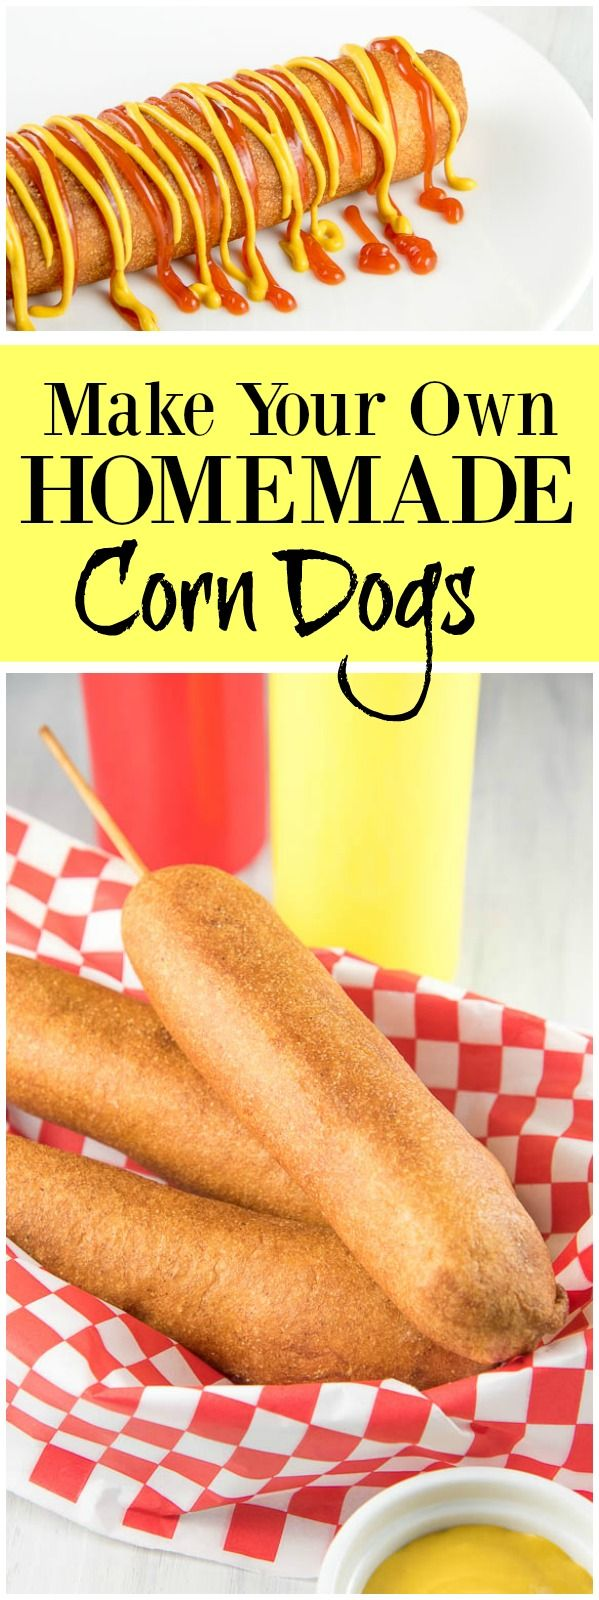 Easy recipe for making Corn Dogs at Home!  - recipe from RecipeGirl.com